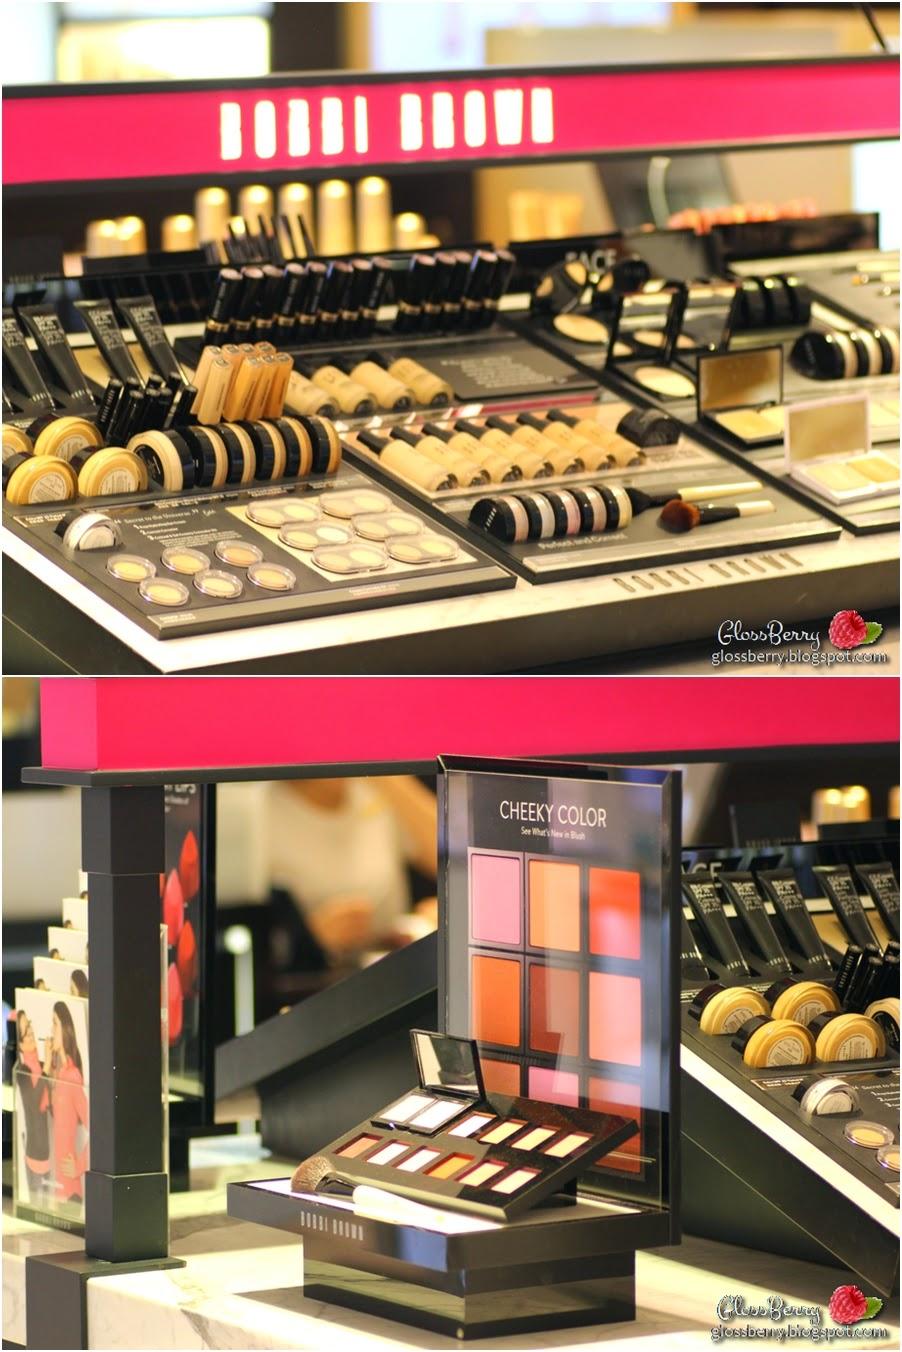 bobbi brown hong kong shopping קניות בהונג קונג איפור קוסמטיקה סאסא